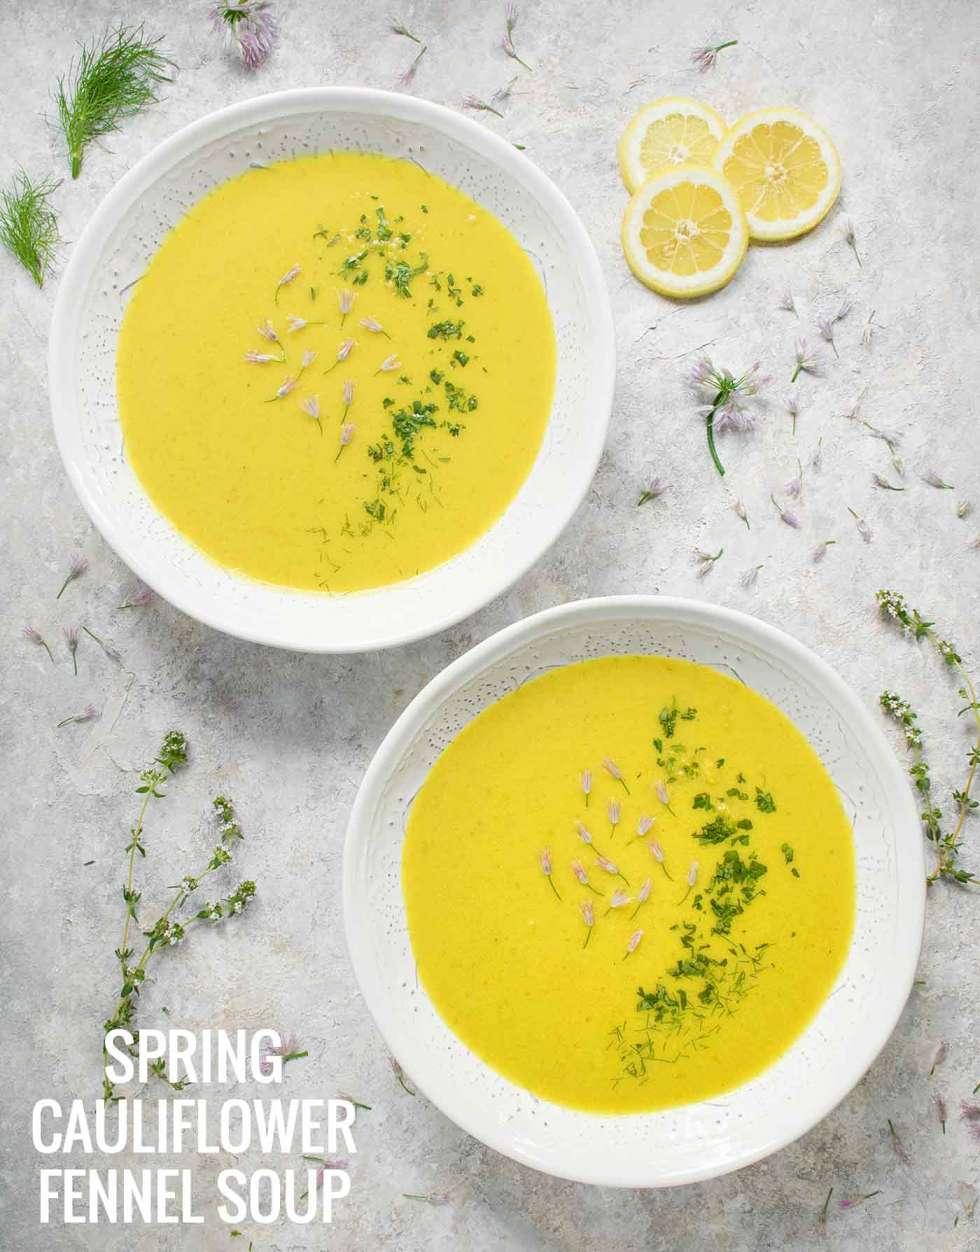 Spring Cauliflower Fennel Soup - Recipe at SoupAddict.com